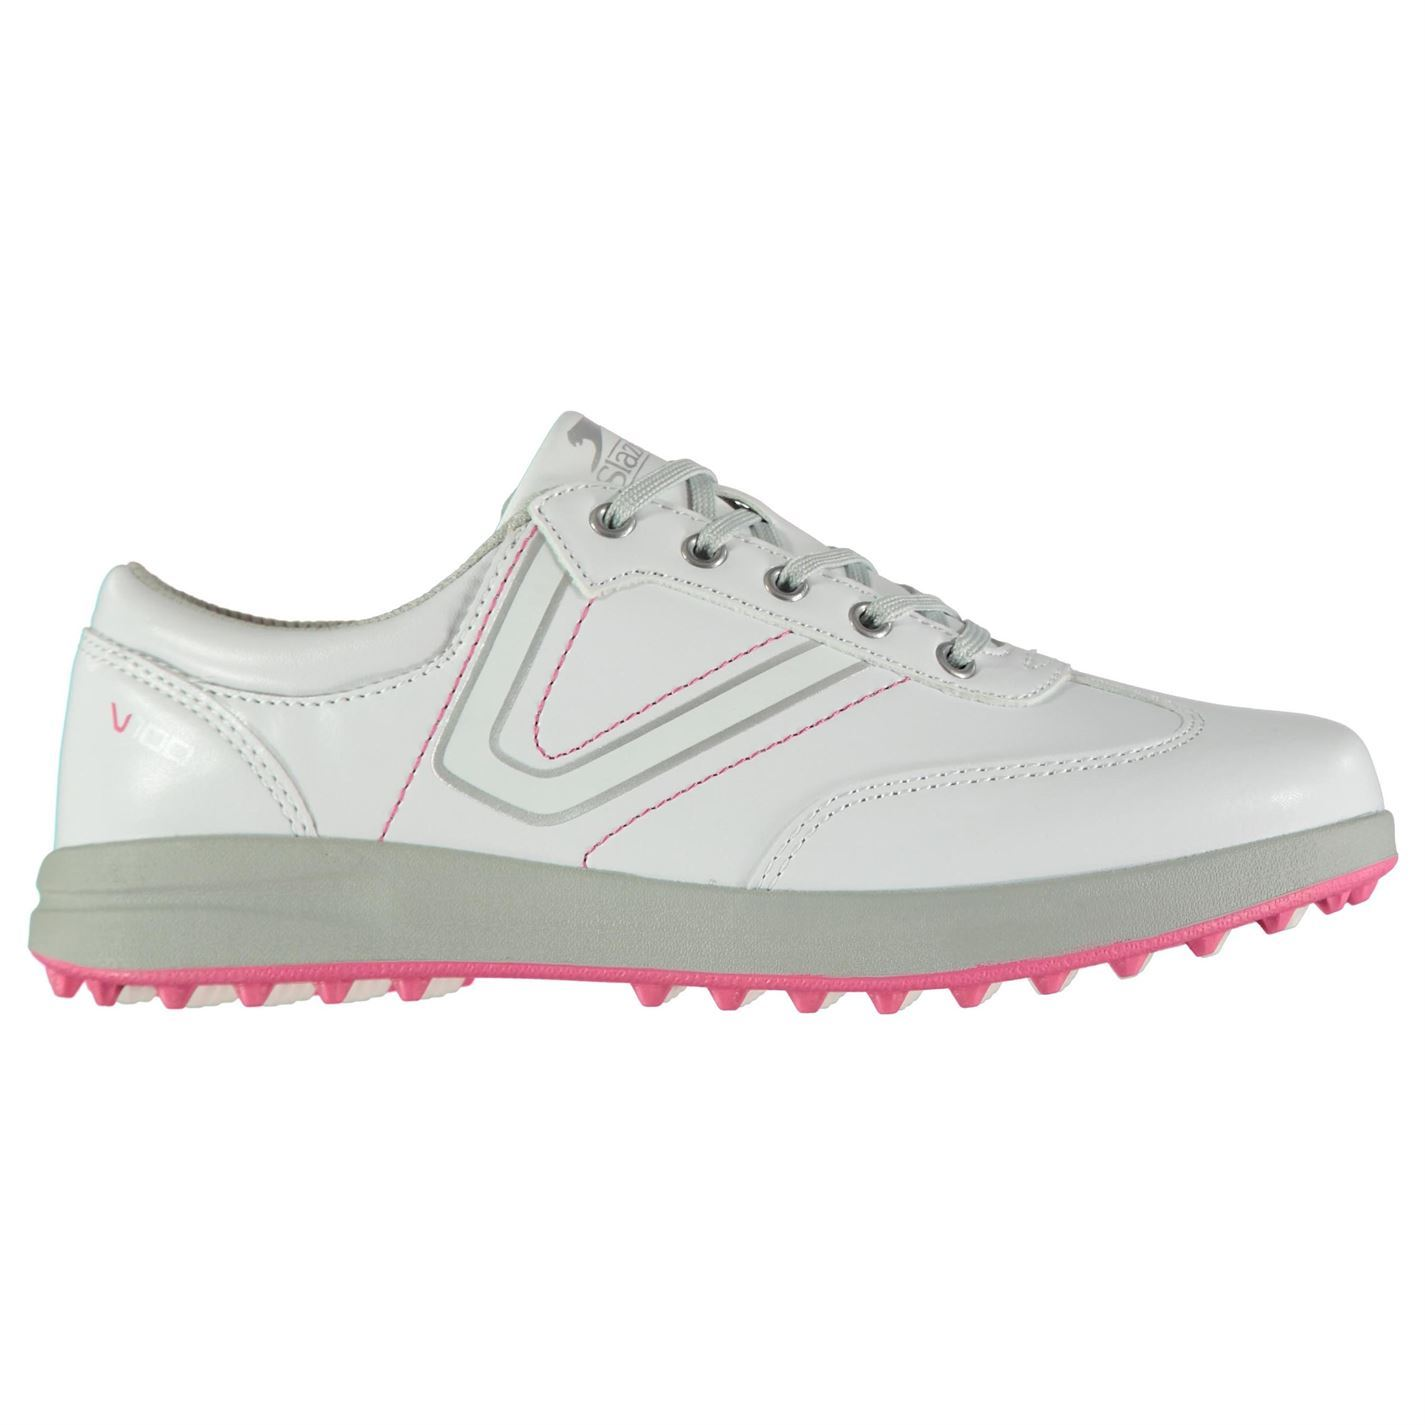 Slazenger Casual Ladies Golf Shoes